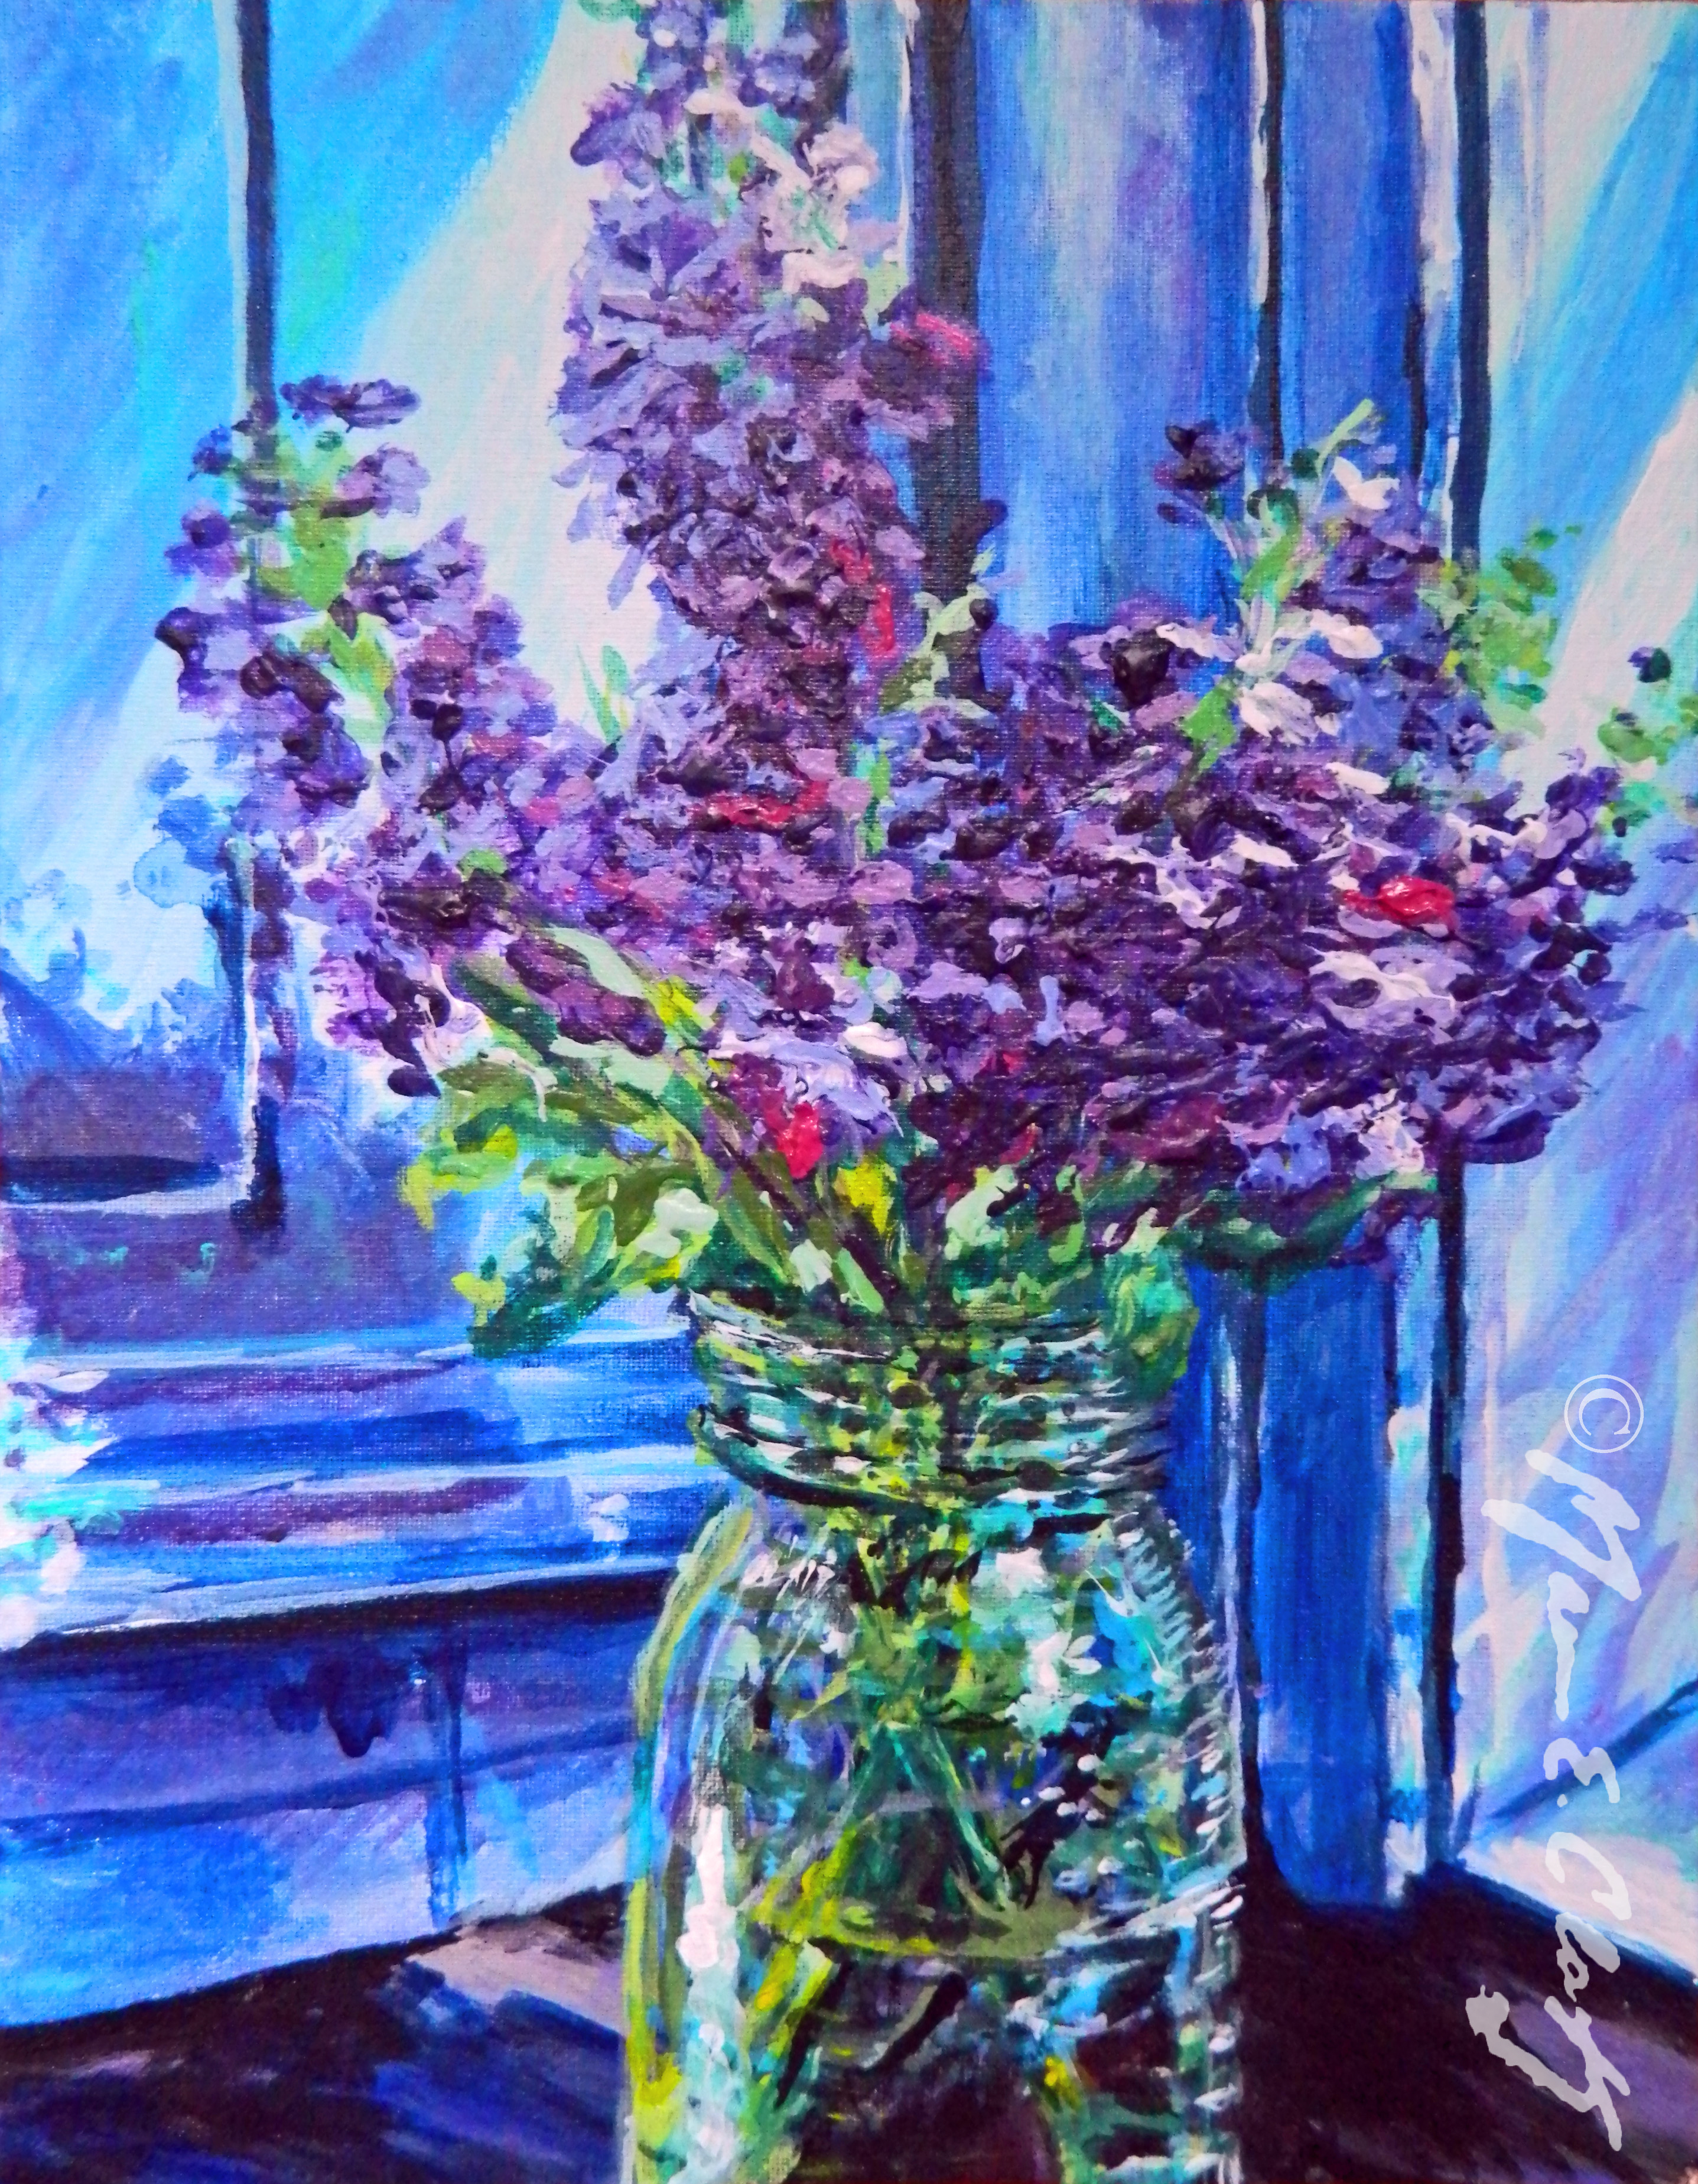 Flower & Mason Jar 6